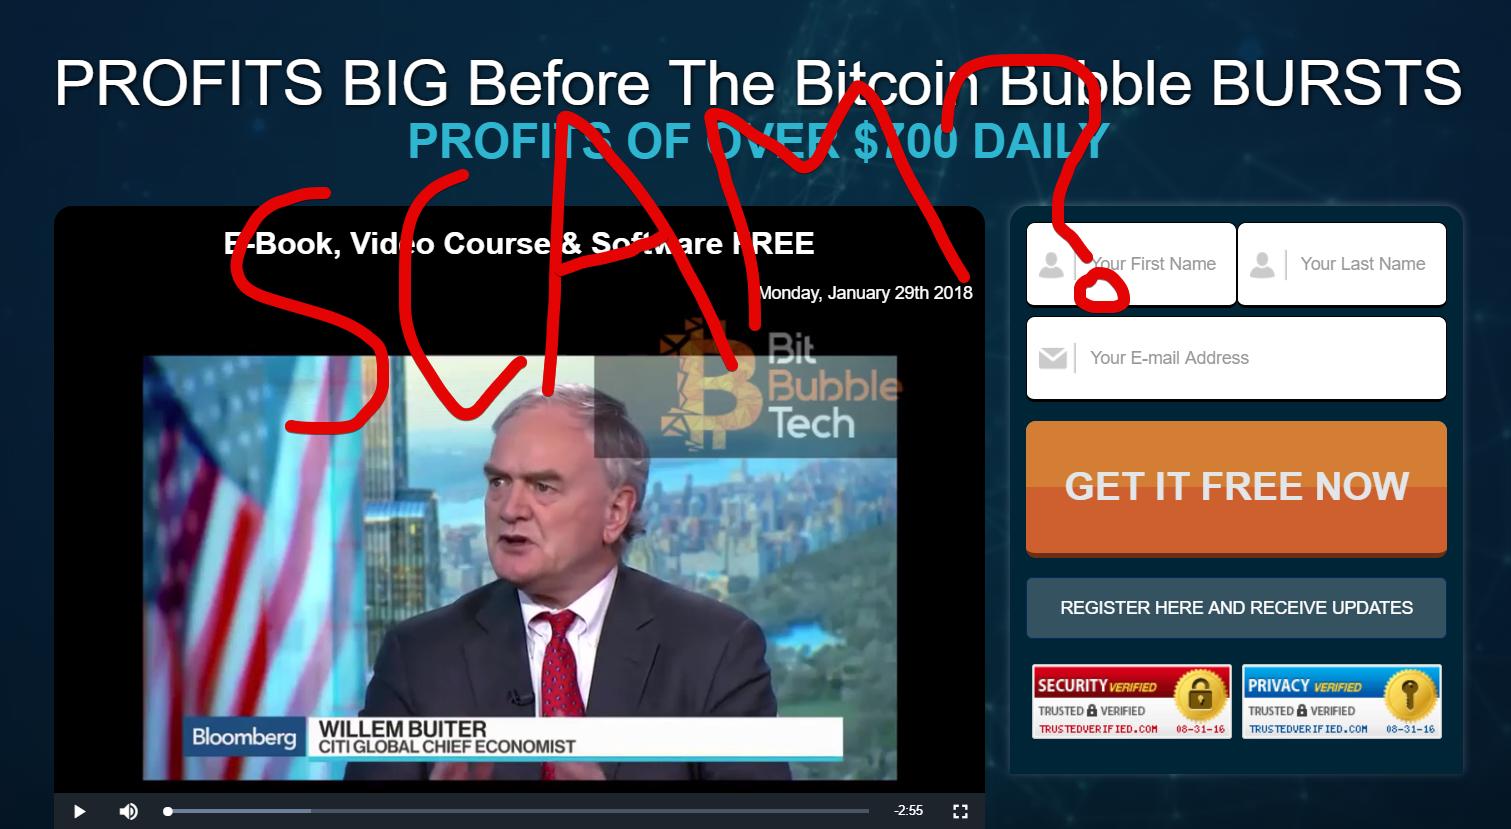 Bitbubble Tech